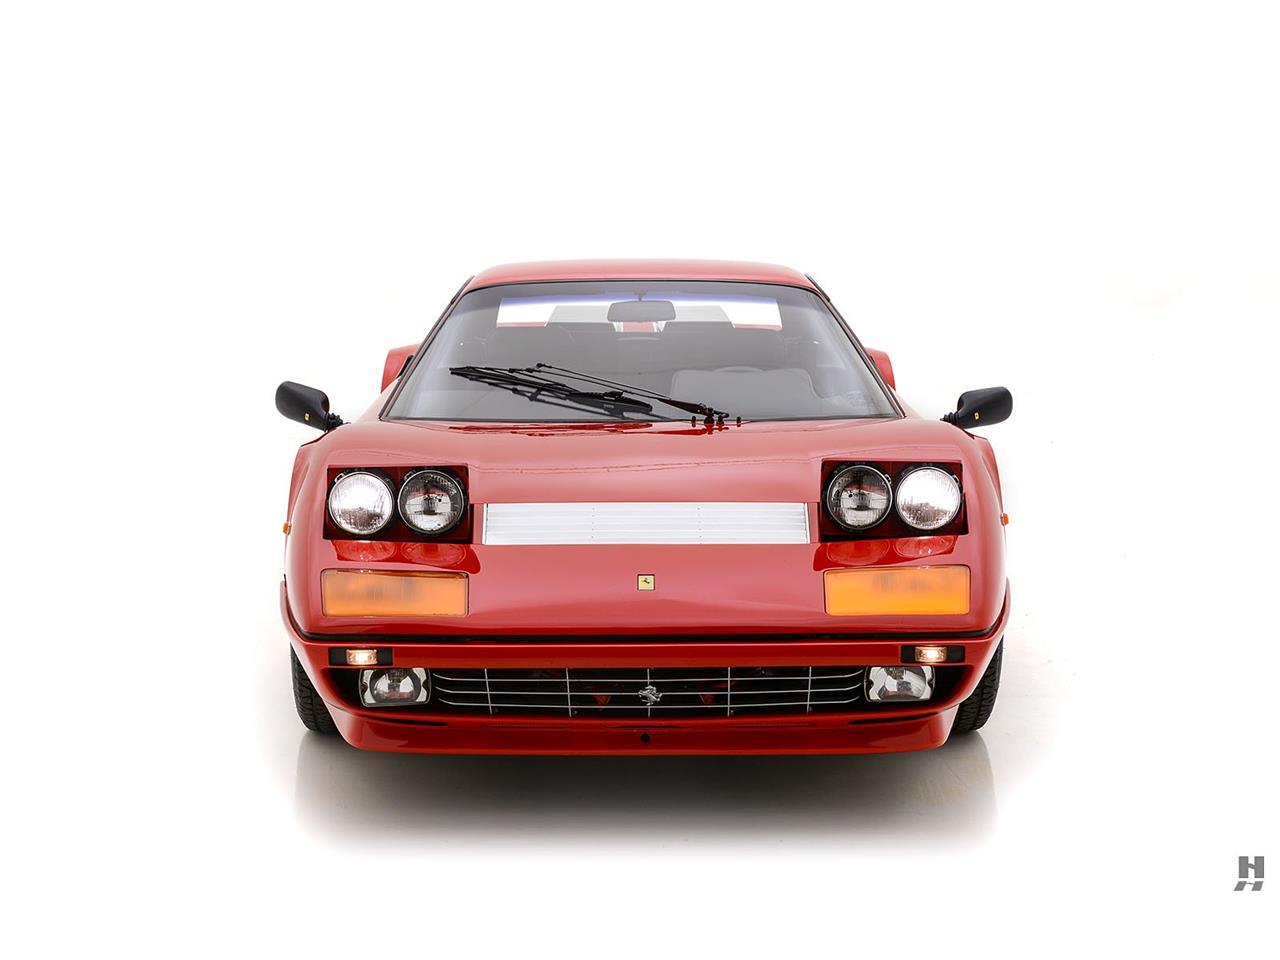 1984 Ferrari 512 BBI (CC-1379475) for sale in Saint Louis, Missouri